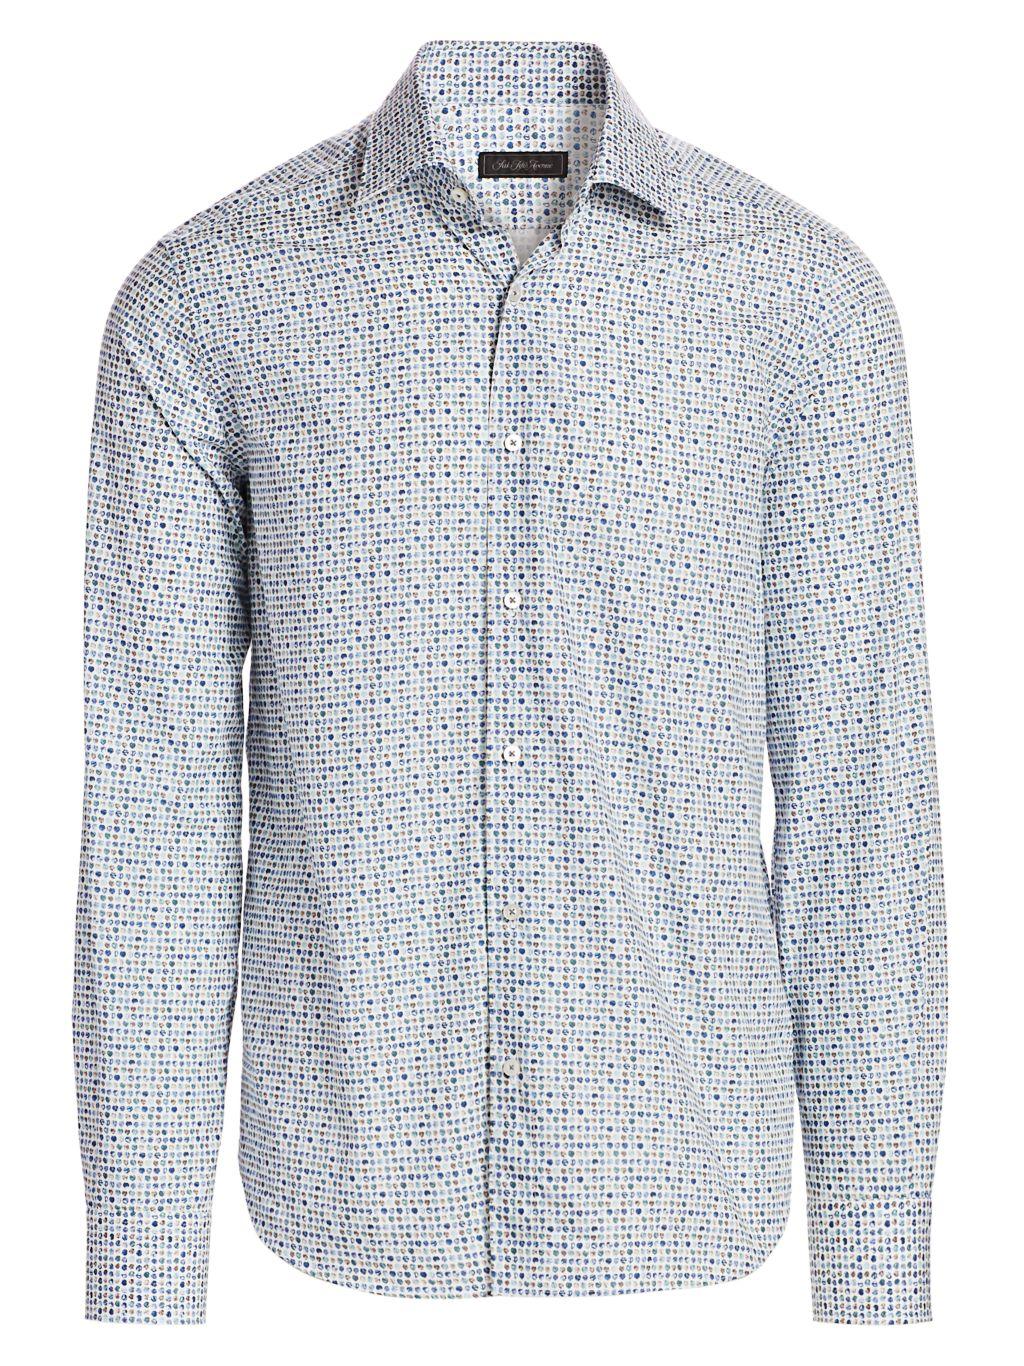 Saks Fifth Avenue COLLECTION Multi-Color Leaf Print Shirt